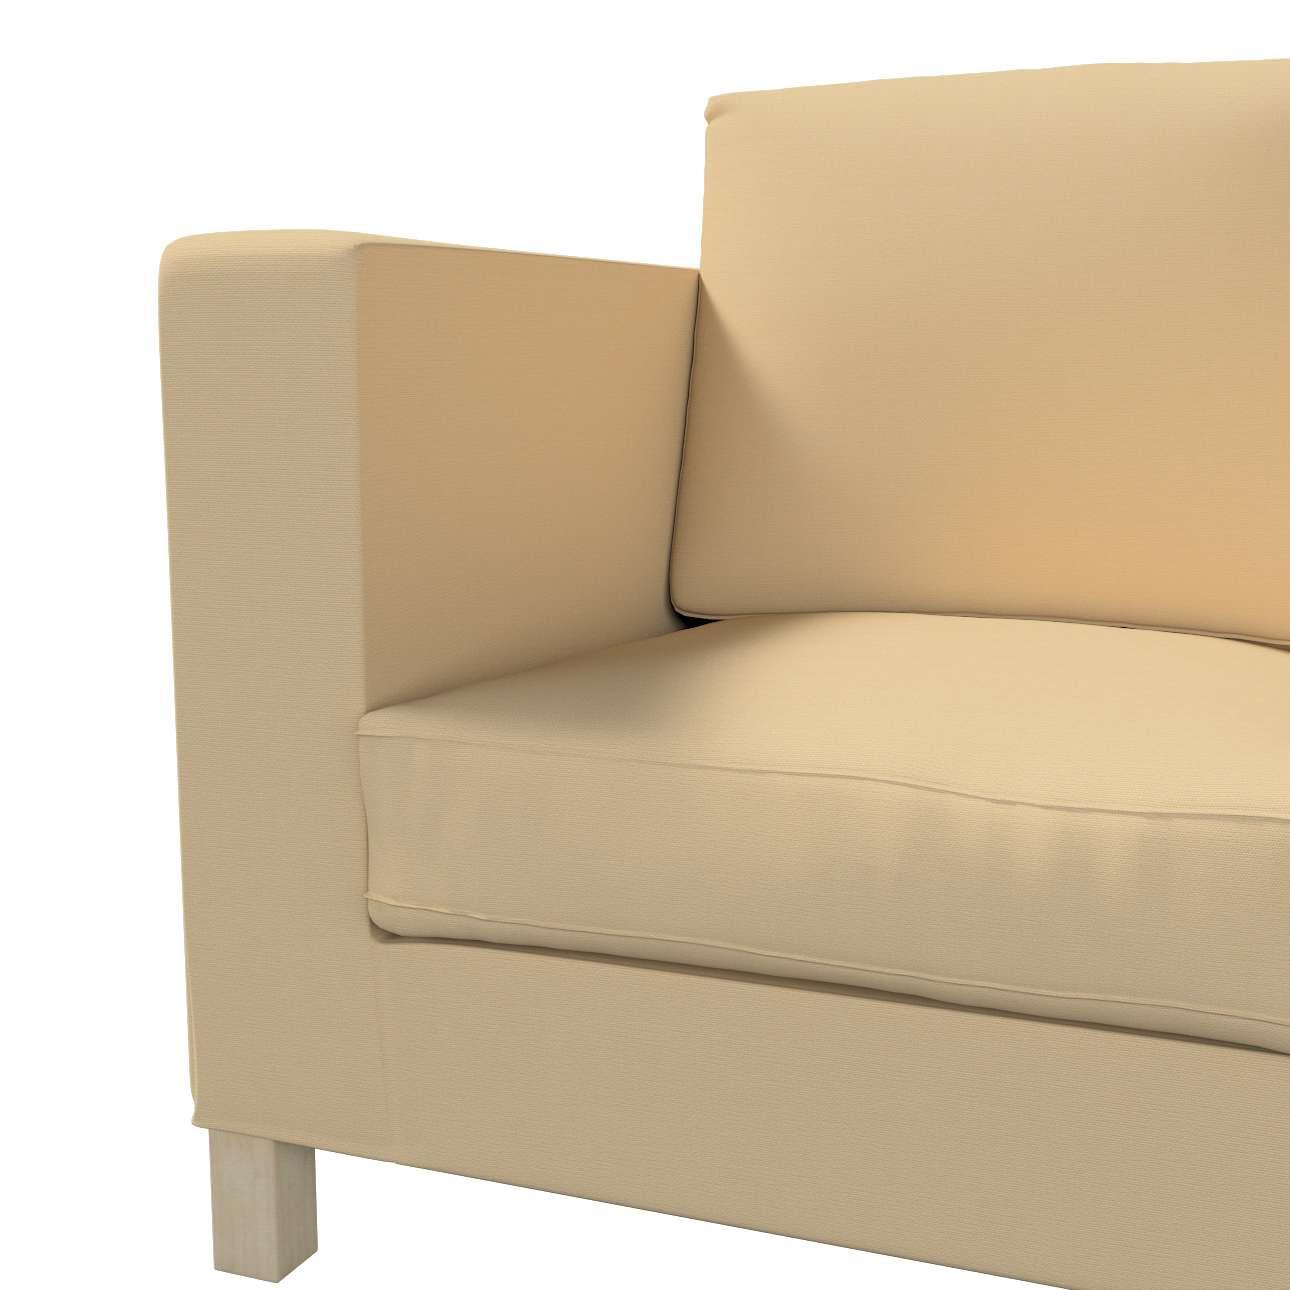 Karlanda klädsel <br>3-sits soffa - kort klädsel i kollektionen Panama Cotton, Tyg: 702-01